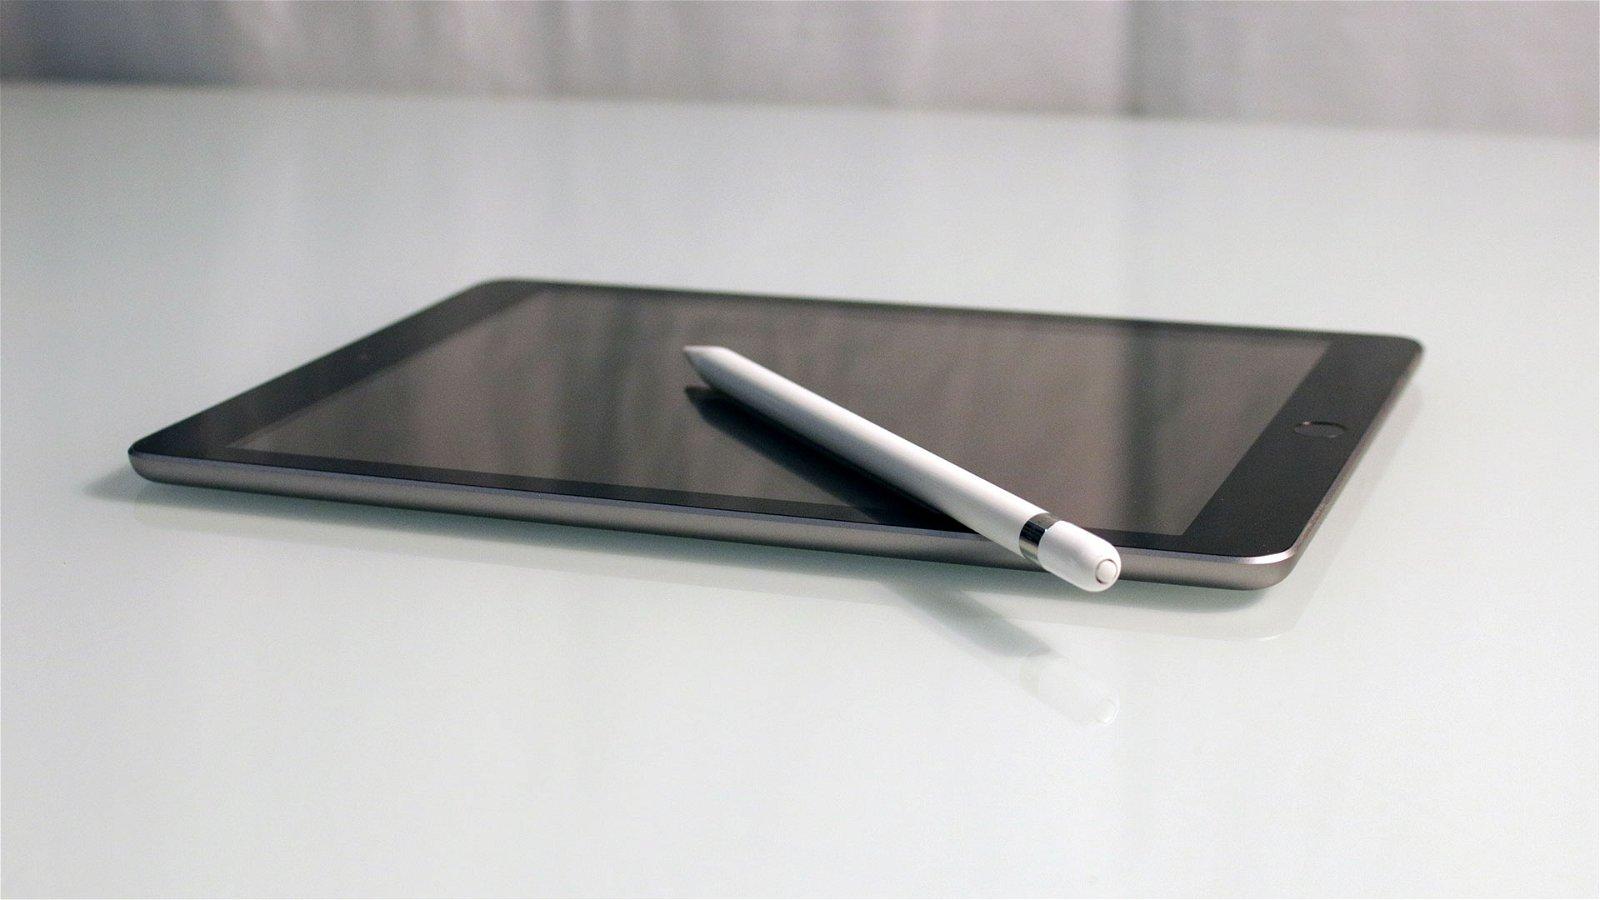 Apple iPad 2018 (Hardware) Review 2